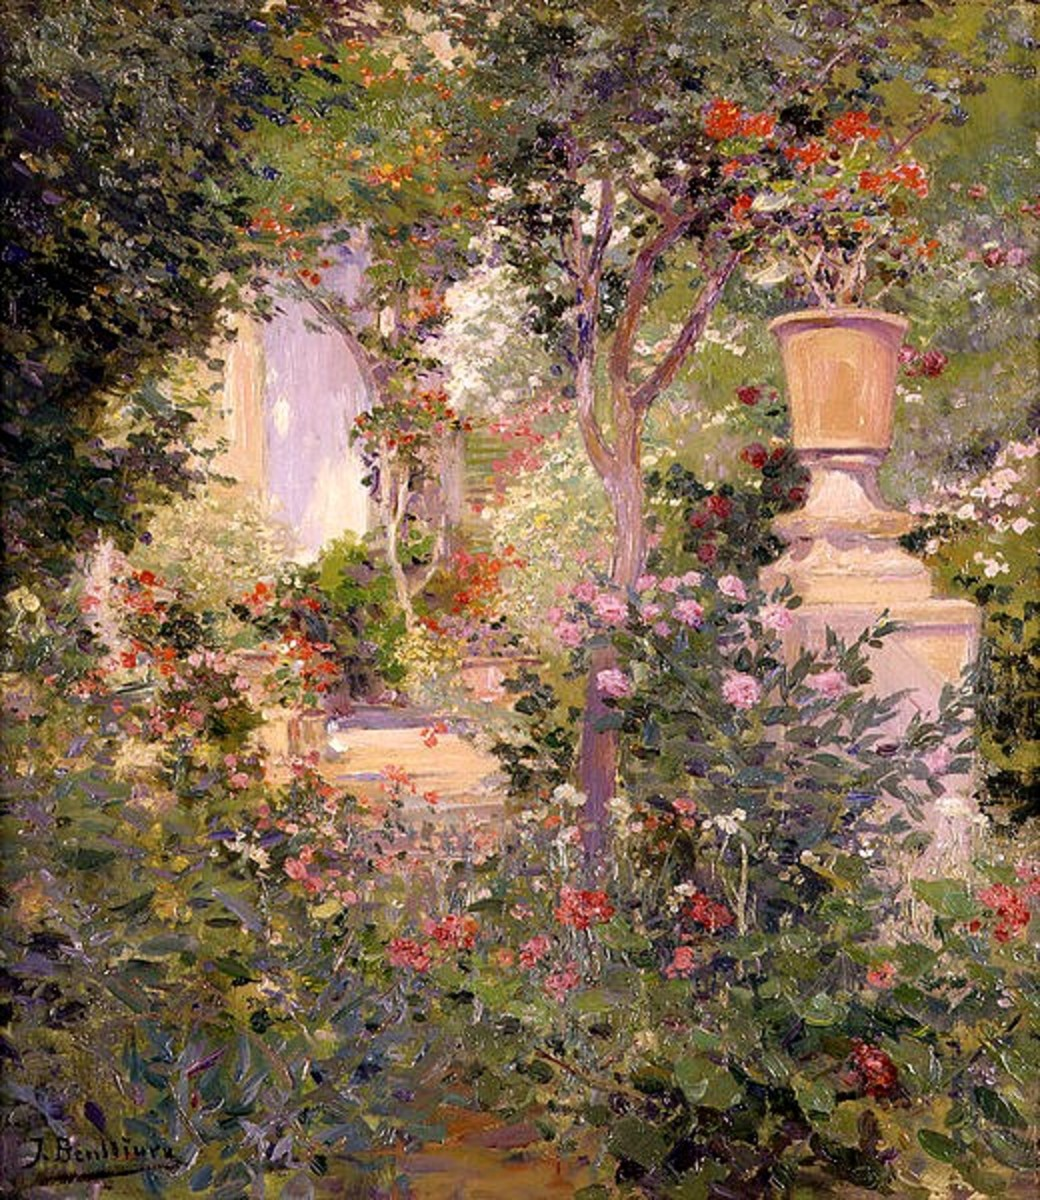 Wikimedia, Garden Painting by Josep Benlliure Gil